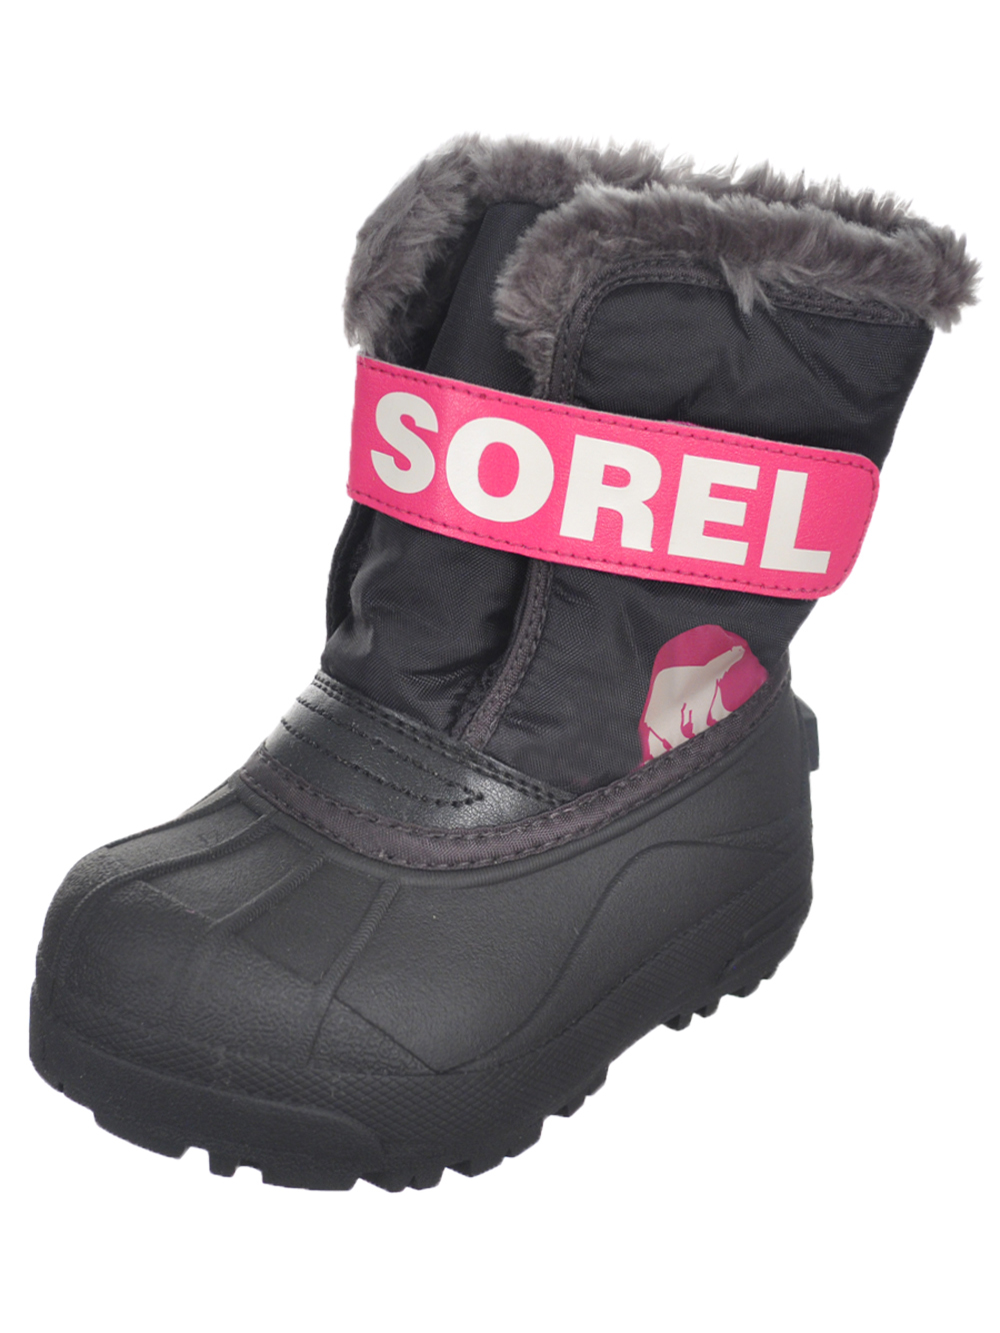 Image of Sorel Unisex Snow Commander Boots Toddler Sizes 8  12  haute pinkblack 9 toddler